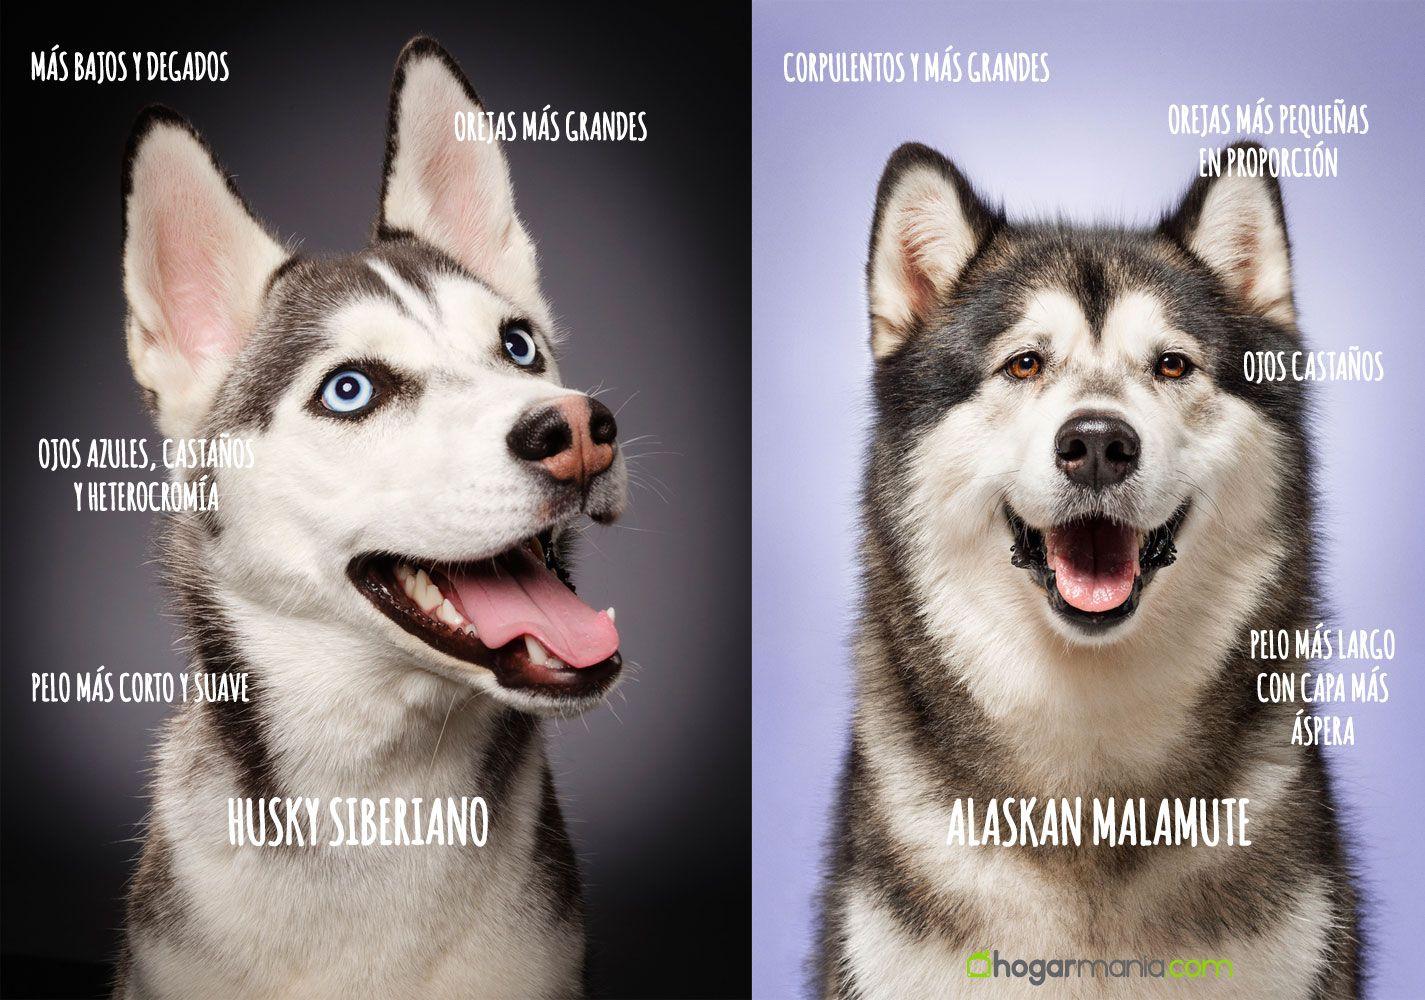 Diferencia entre Alaskan Malamute y Husky Siberiano.